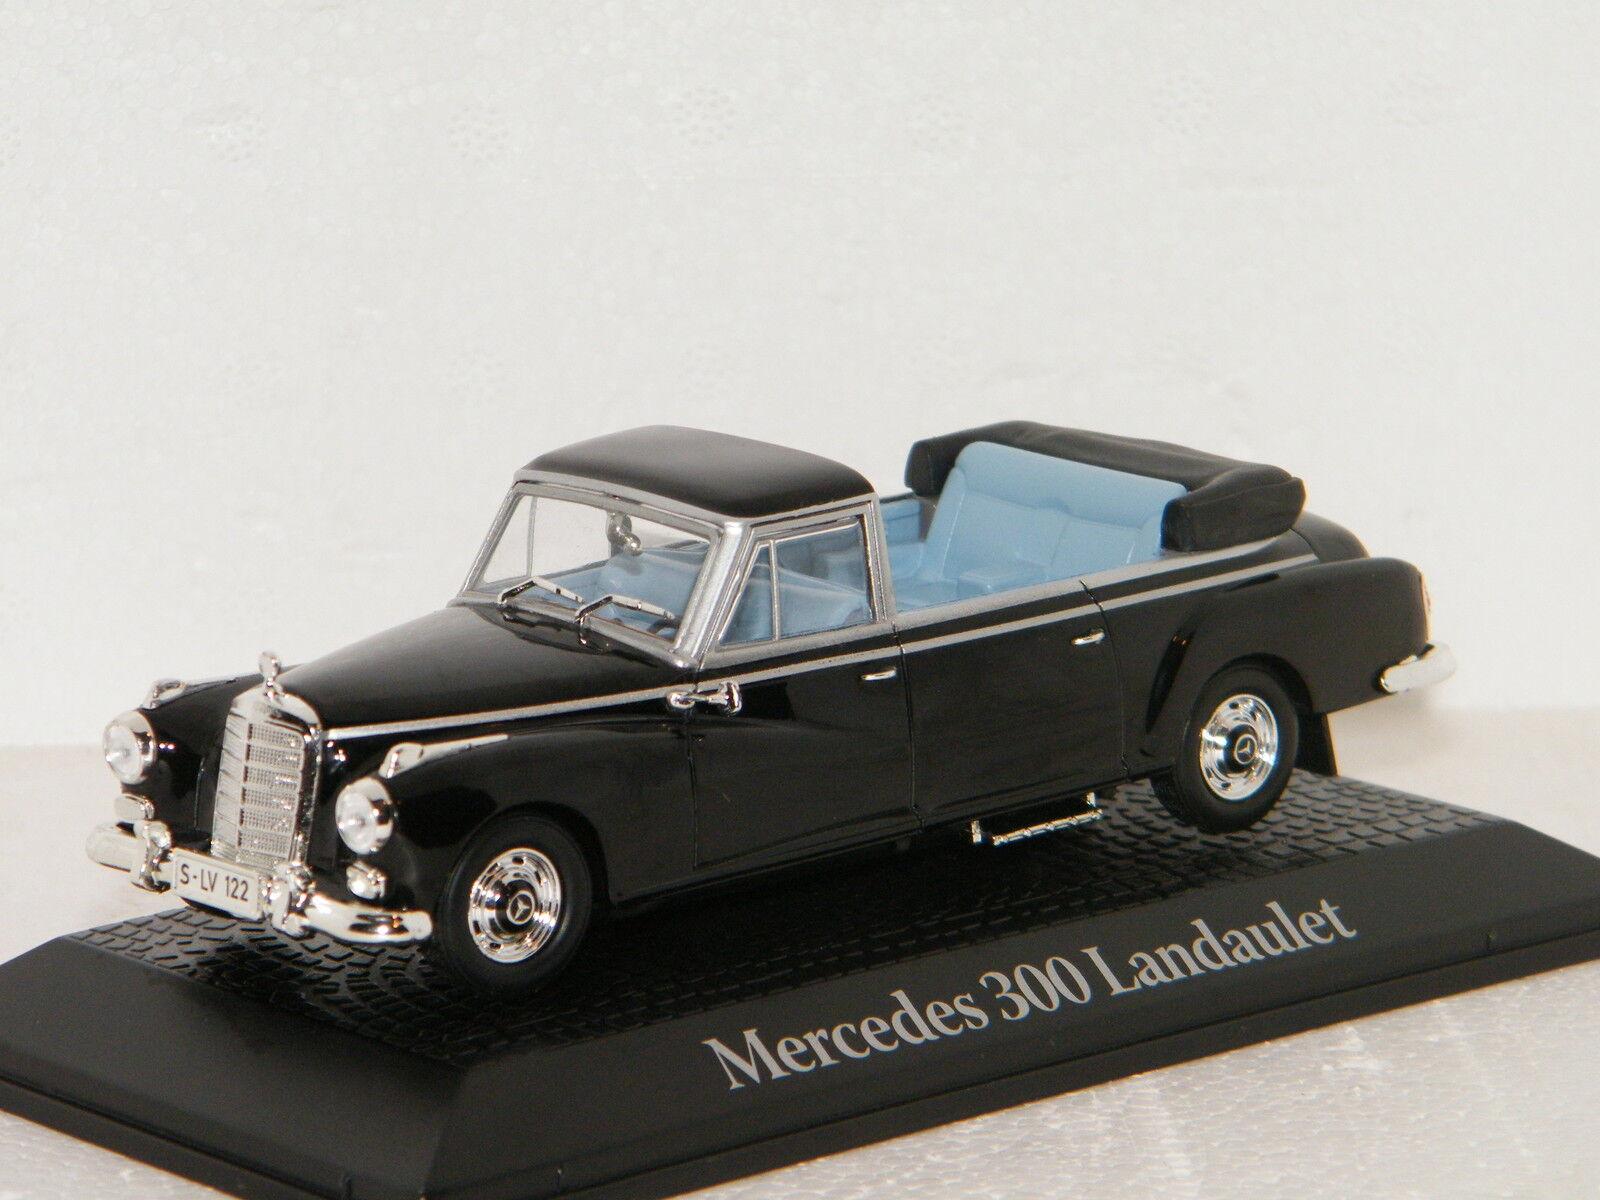 MERCEDES 300 D LANDAULET Adenauer 1963 NOREV 1 43 Ref 351232